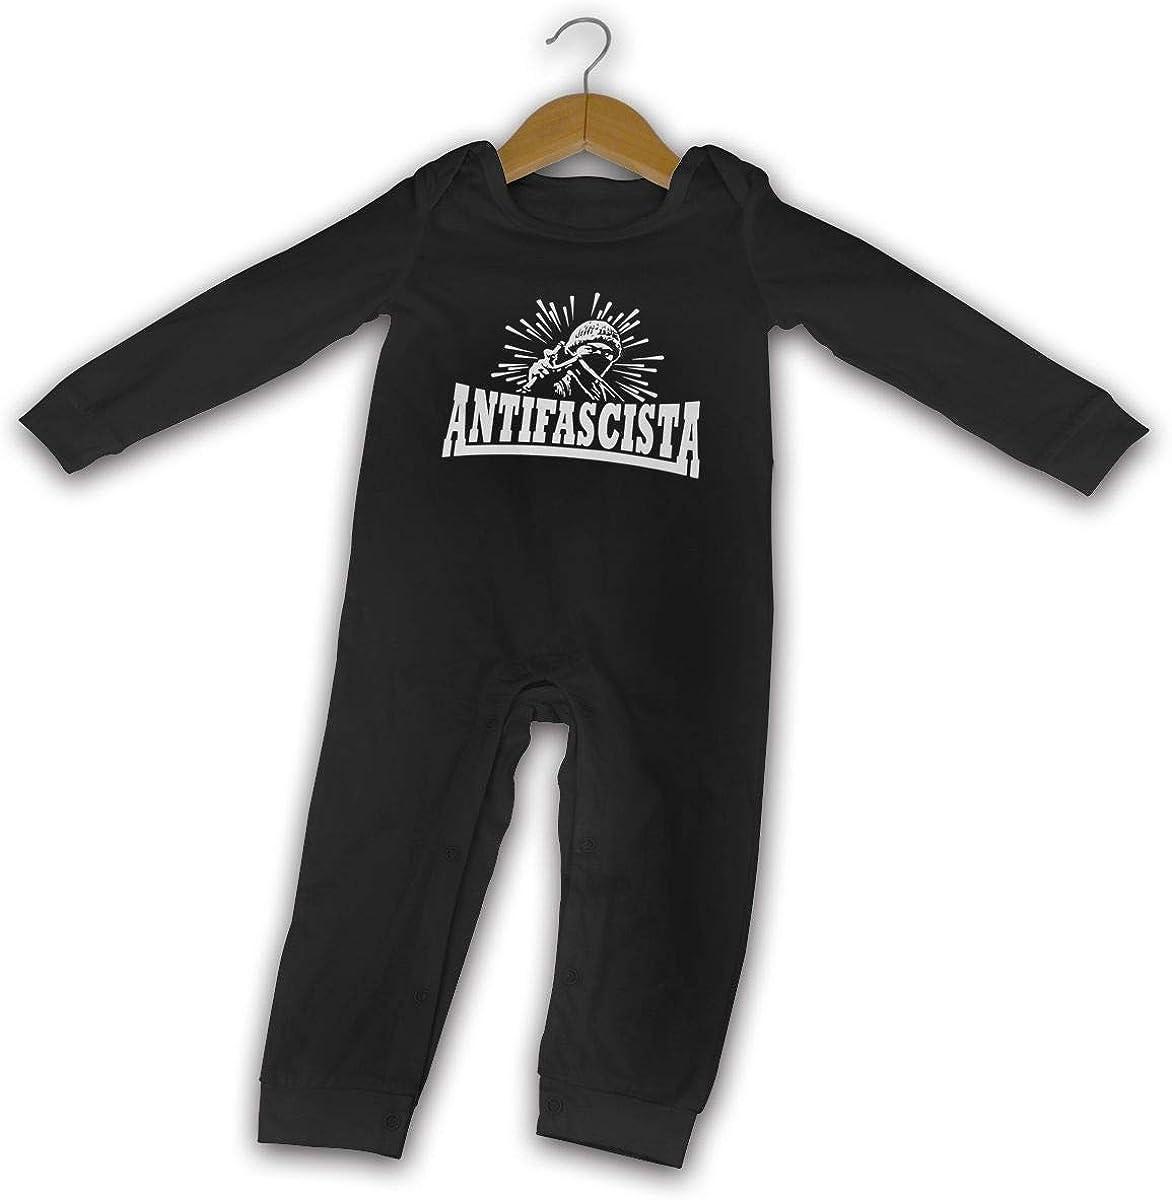 YELTY6F Antifascista Anti-Fascist Printed Boys Girls Jumpsuit Long Sleeve Pajamas Black